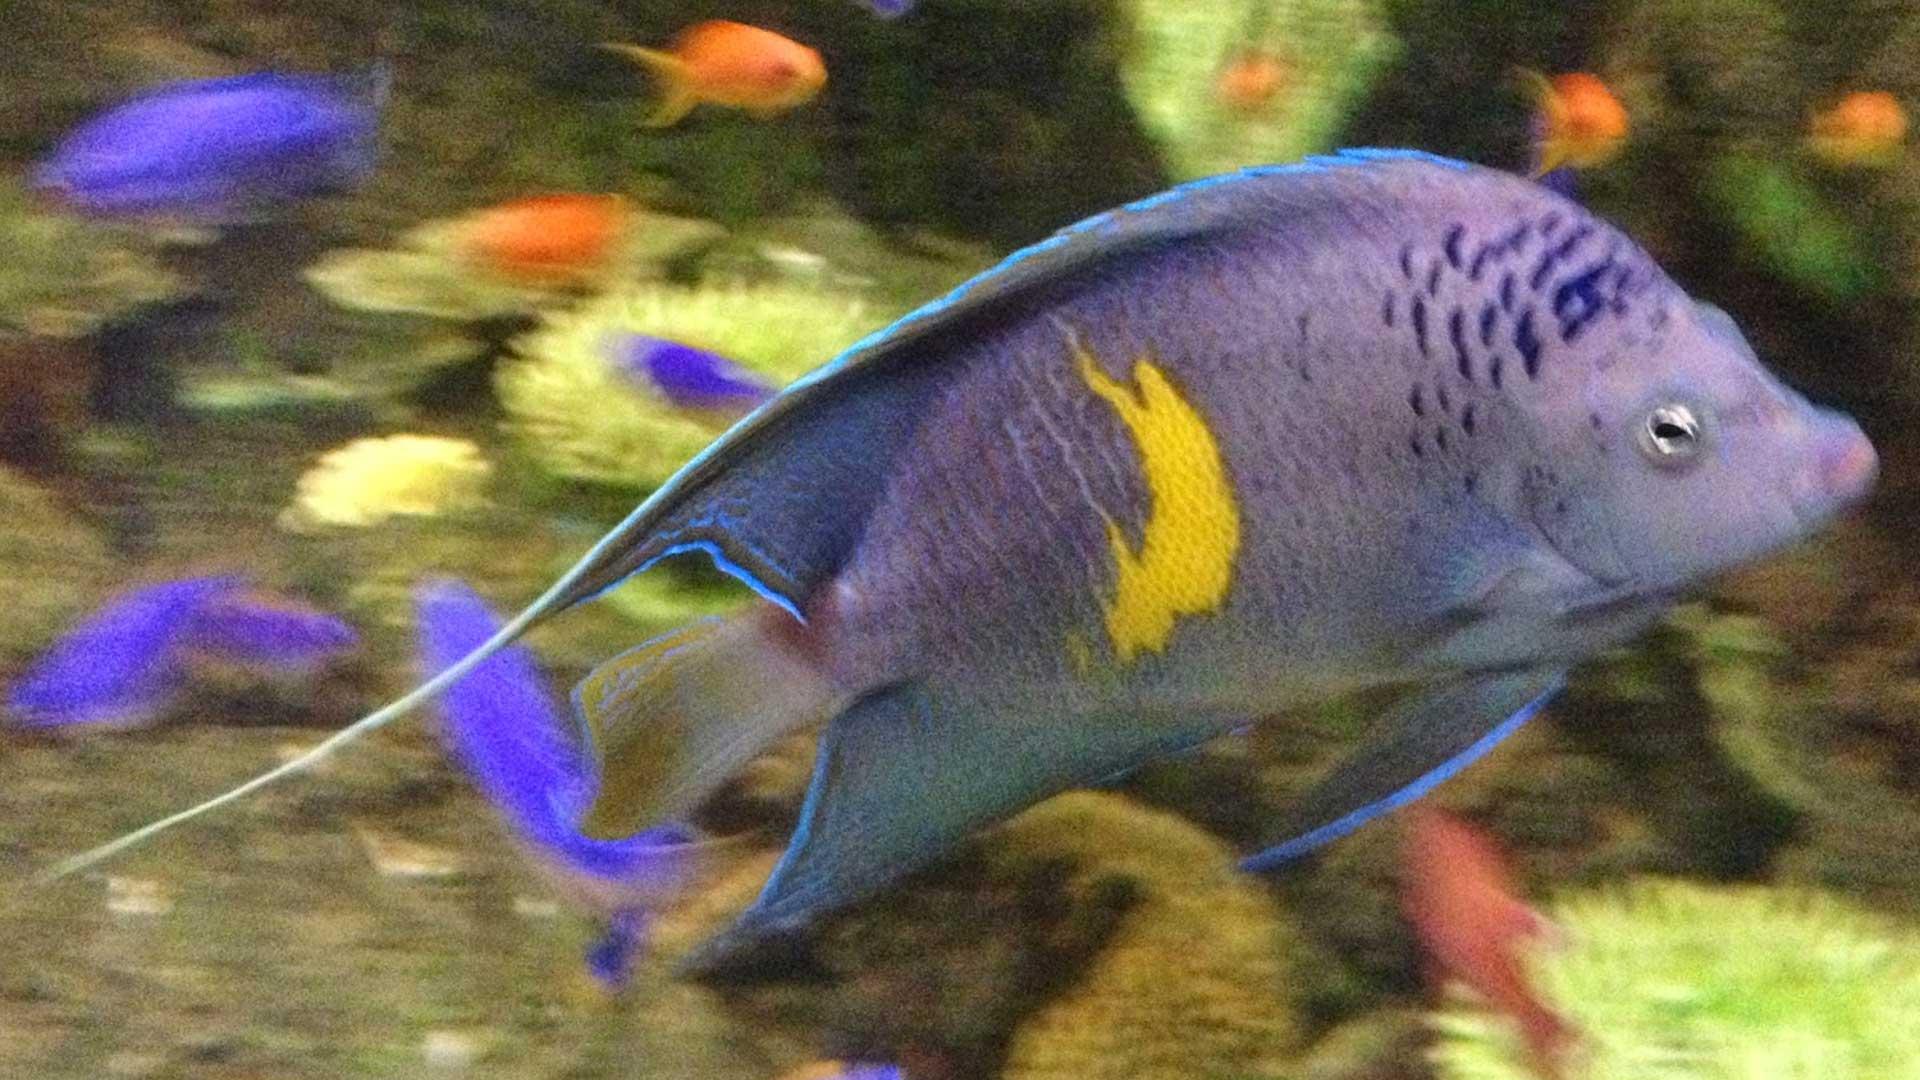 Figure 1.  Angelfish (2-3 years old) on display at Columbus Zoo and Aquarium. Photo credit: Ramon Villaverde.